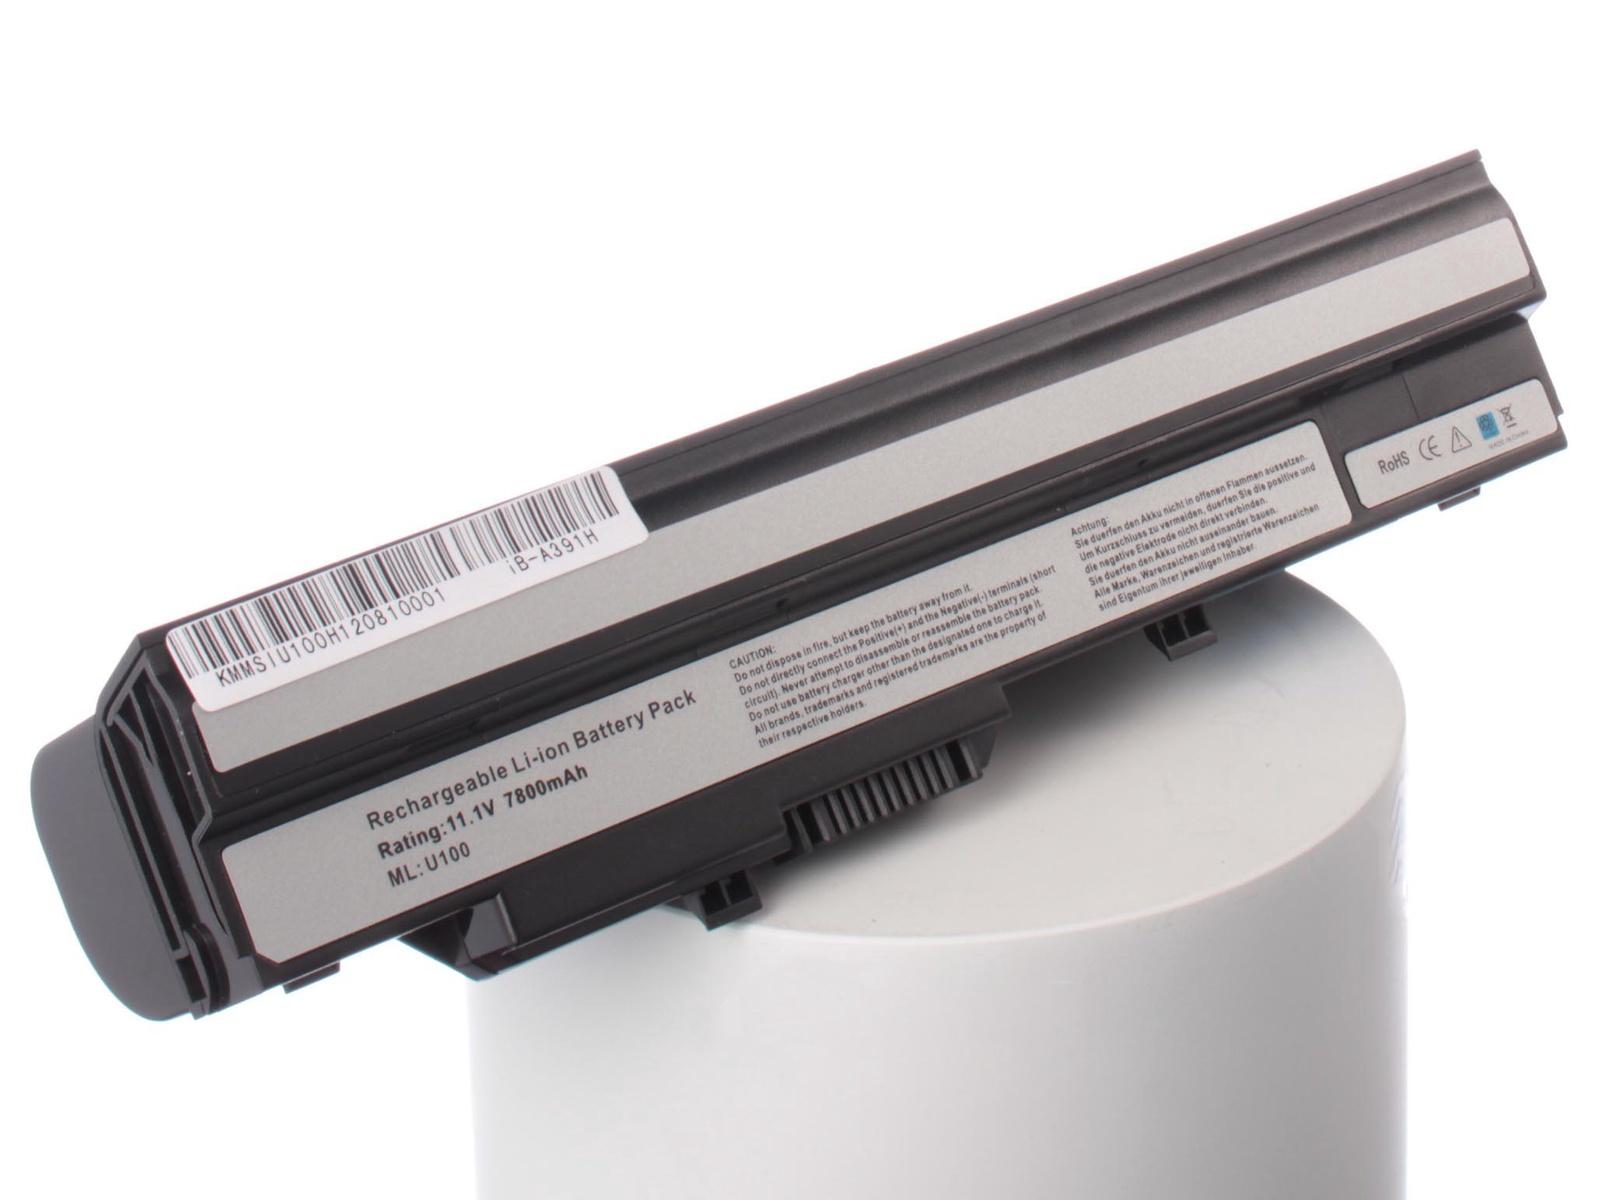 Аккумулятор для ноутбука iBatt MSI, Rover book BTY-S11, BTY-S12, BTY-S13, 14L-MS6837D1, 3715A-MS6837D1 аккумулятор для ноутбука hp compaq hstnn lb12 hstnn ib12 hstnn c02c hstnn ub12 hstnn ib27 nc4200 nc4400 tc4200 6cell tc4400 hstnn ib12